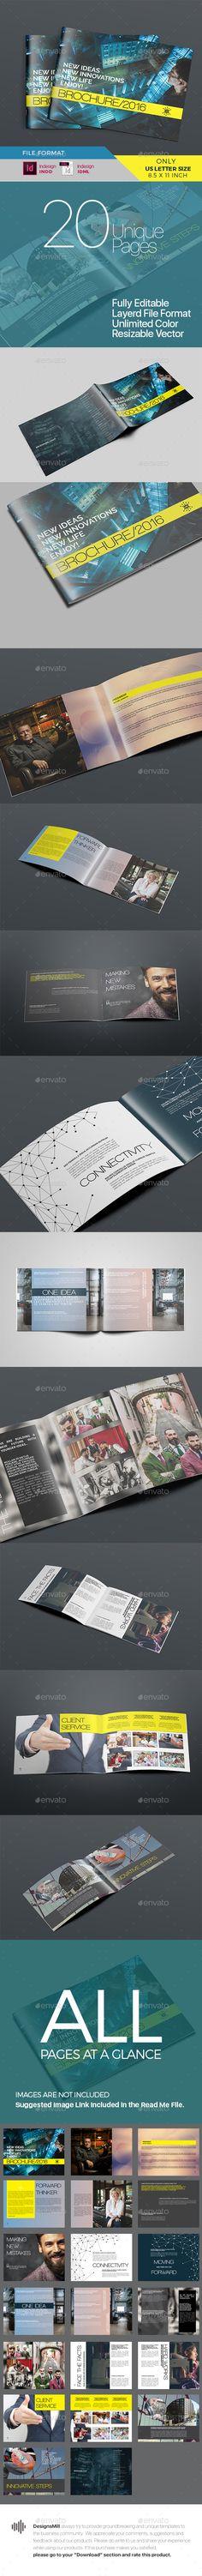 Brochure — InDesign INDD #clean #marketing kit • Download ➝ https://graphicriver.net/item/color-juice-brochure/19053277?ref=pxcr